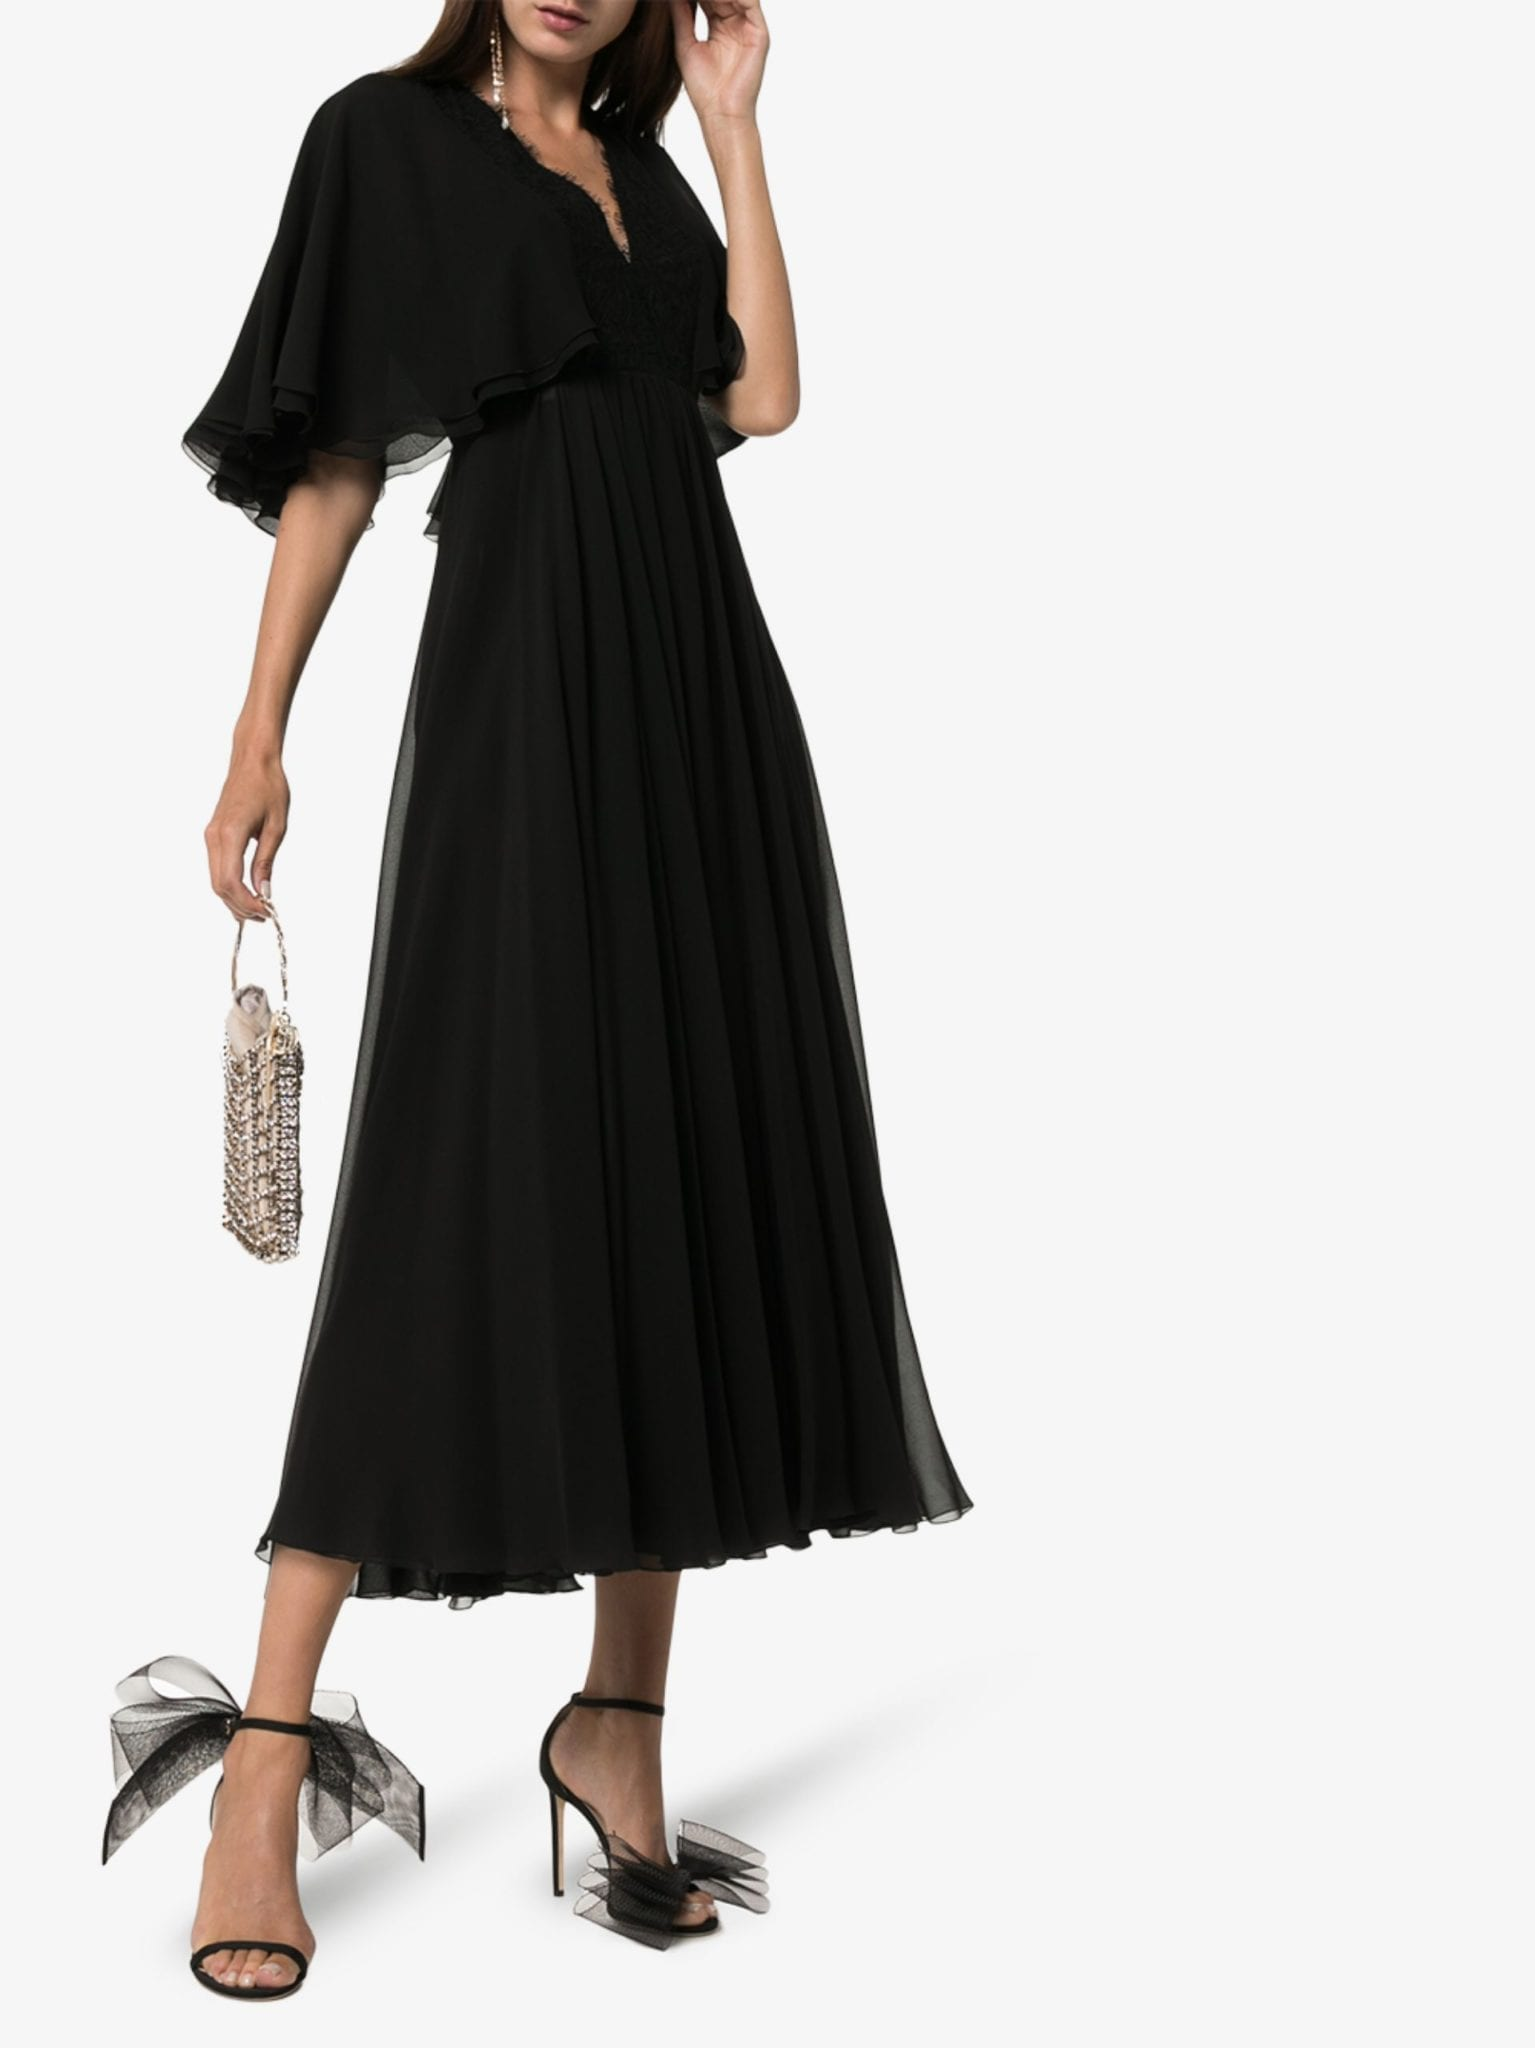 GIAMBATTISTA VALLI Georgette Flared Sleeve Dress